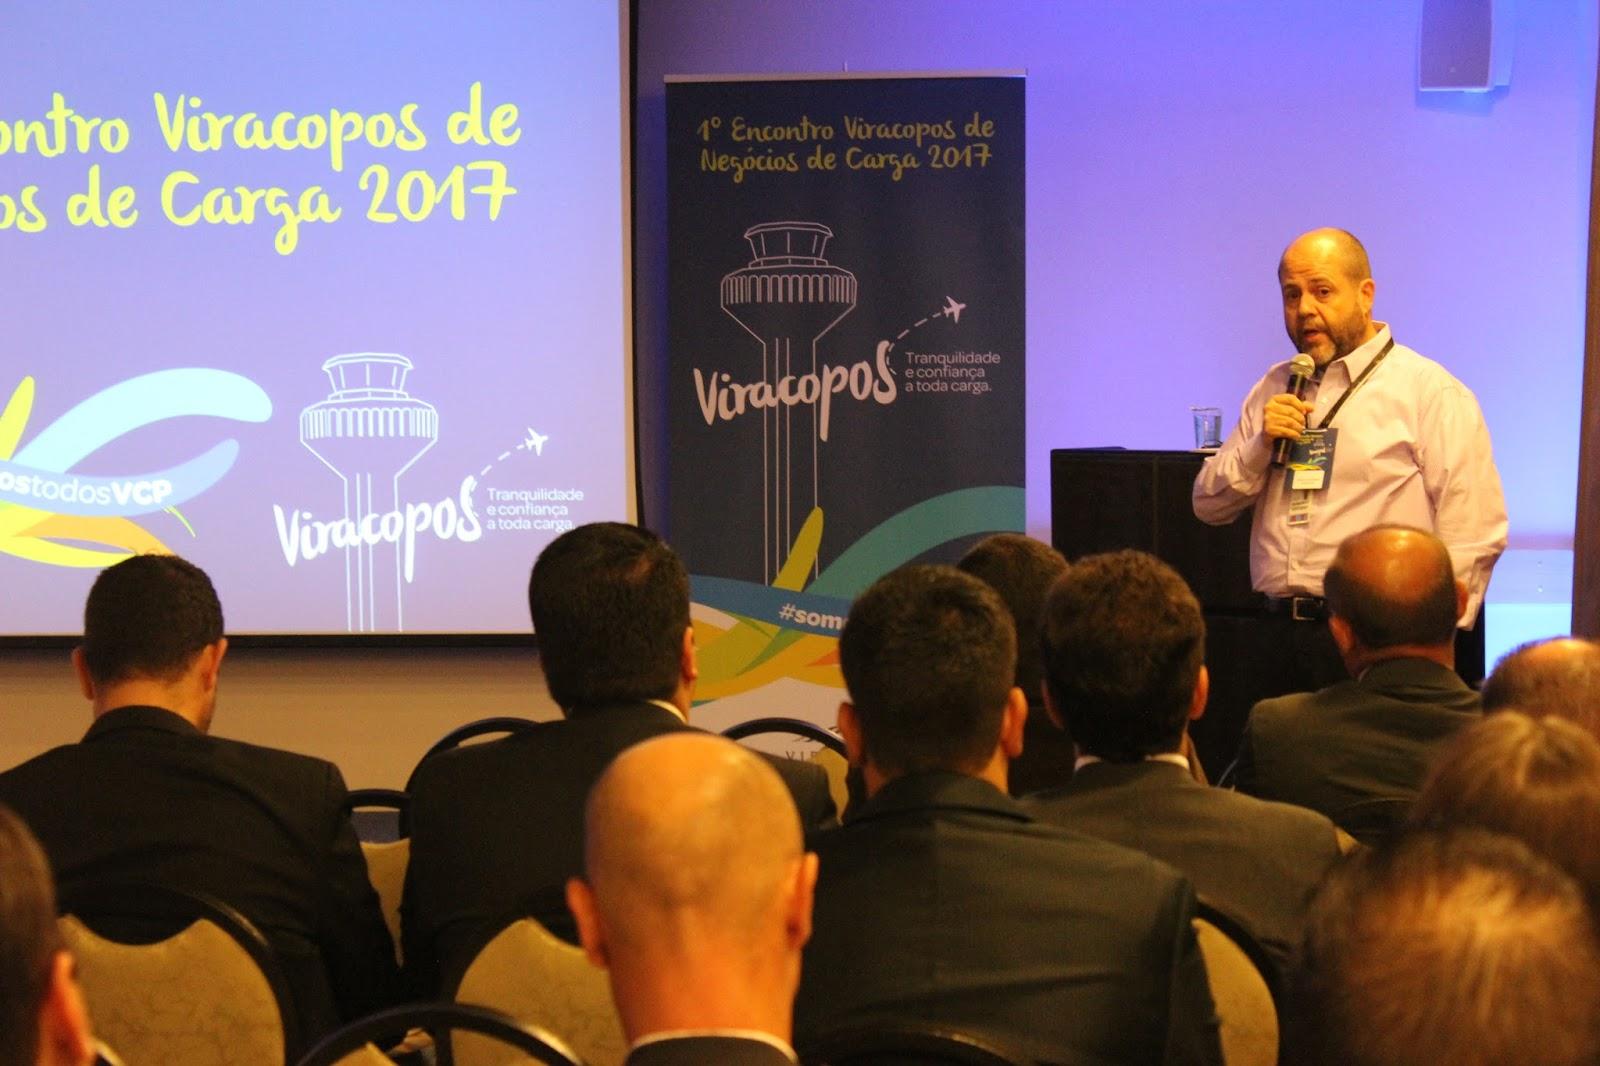 Viracopos realiza o 1º Encontro de Negócios de Carga